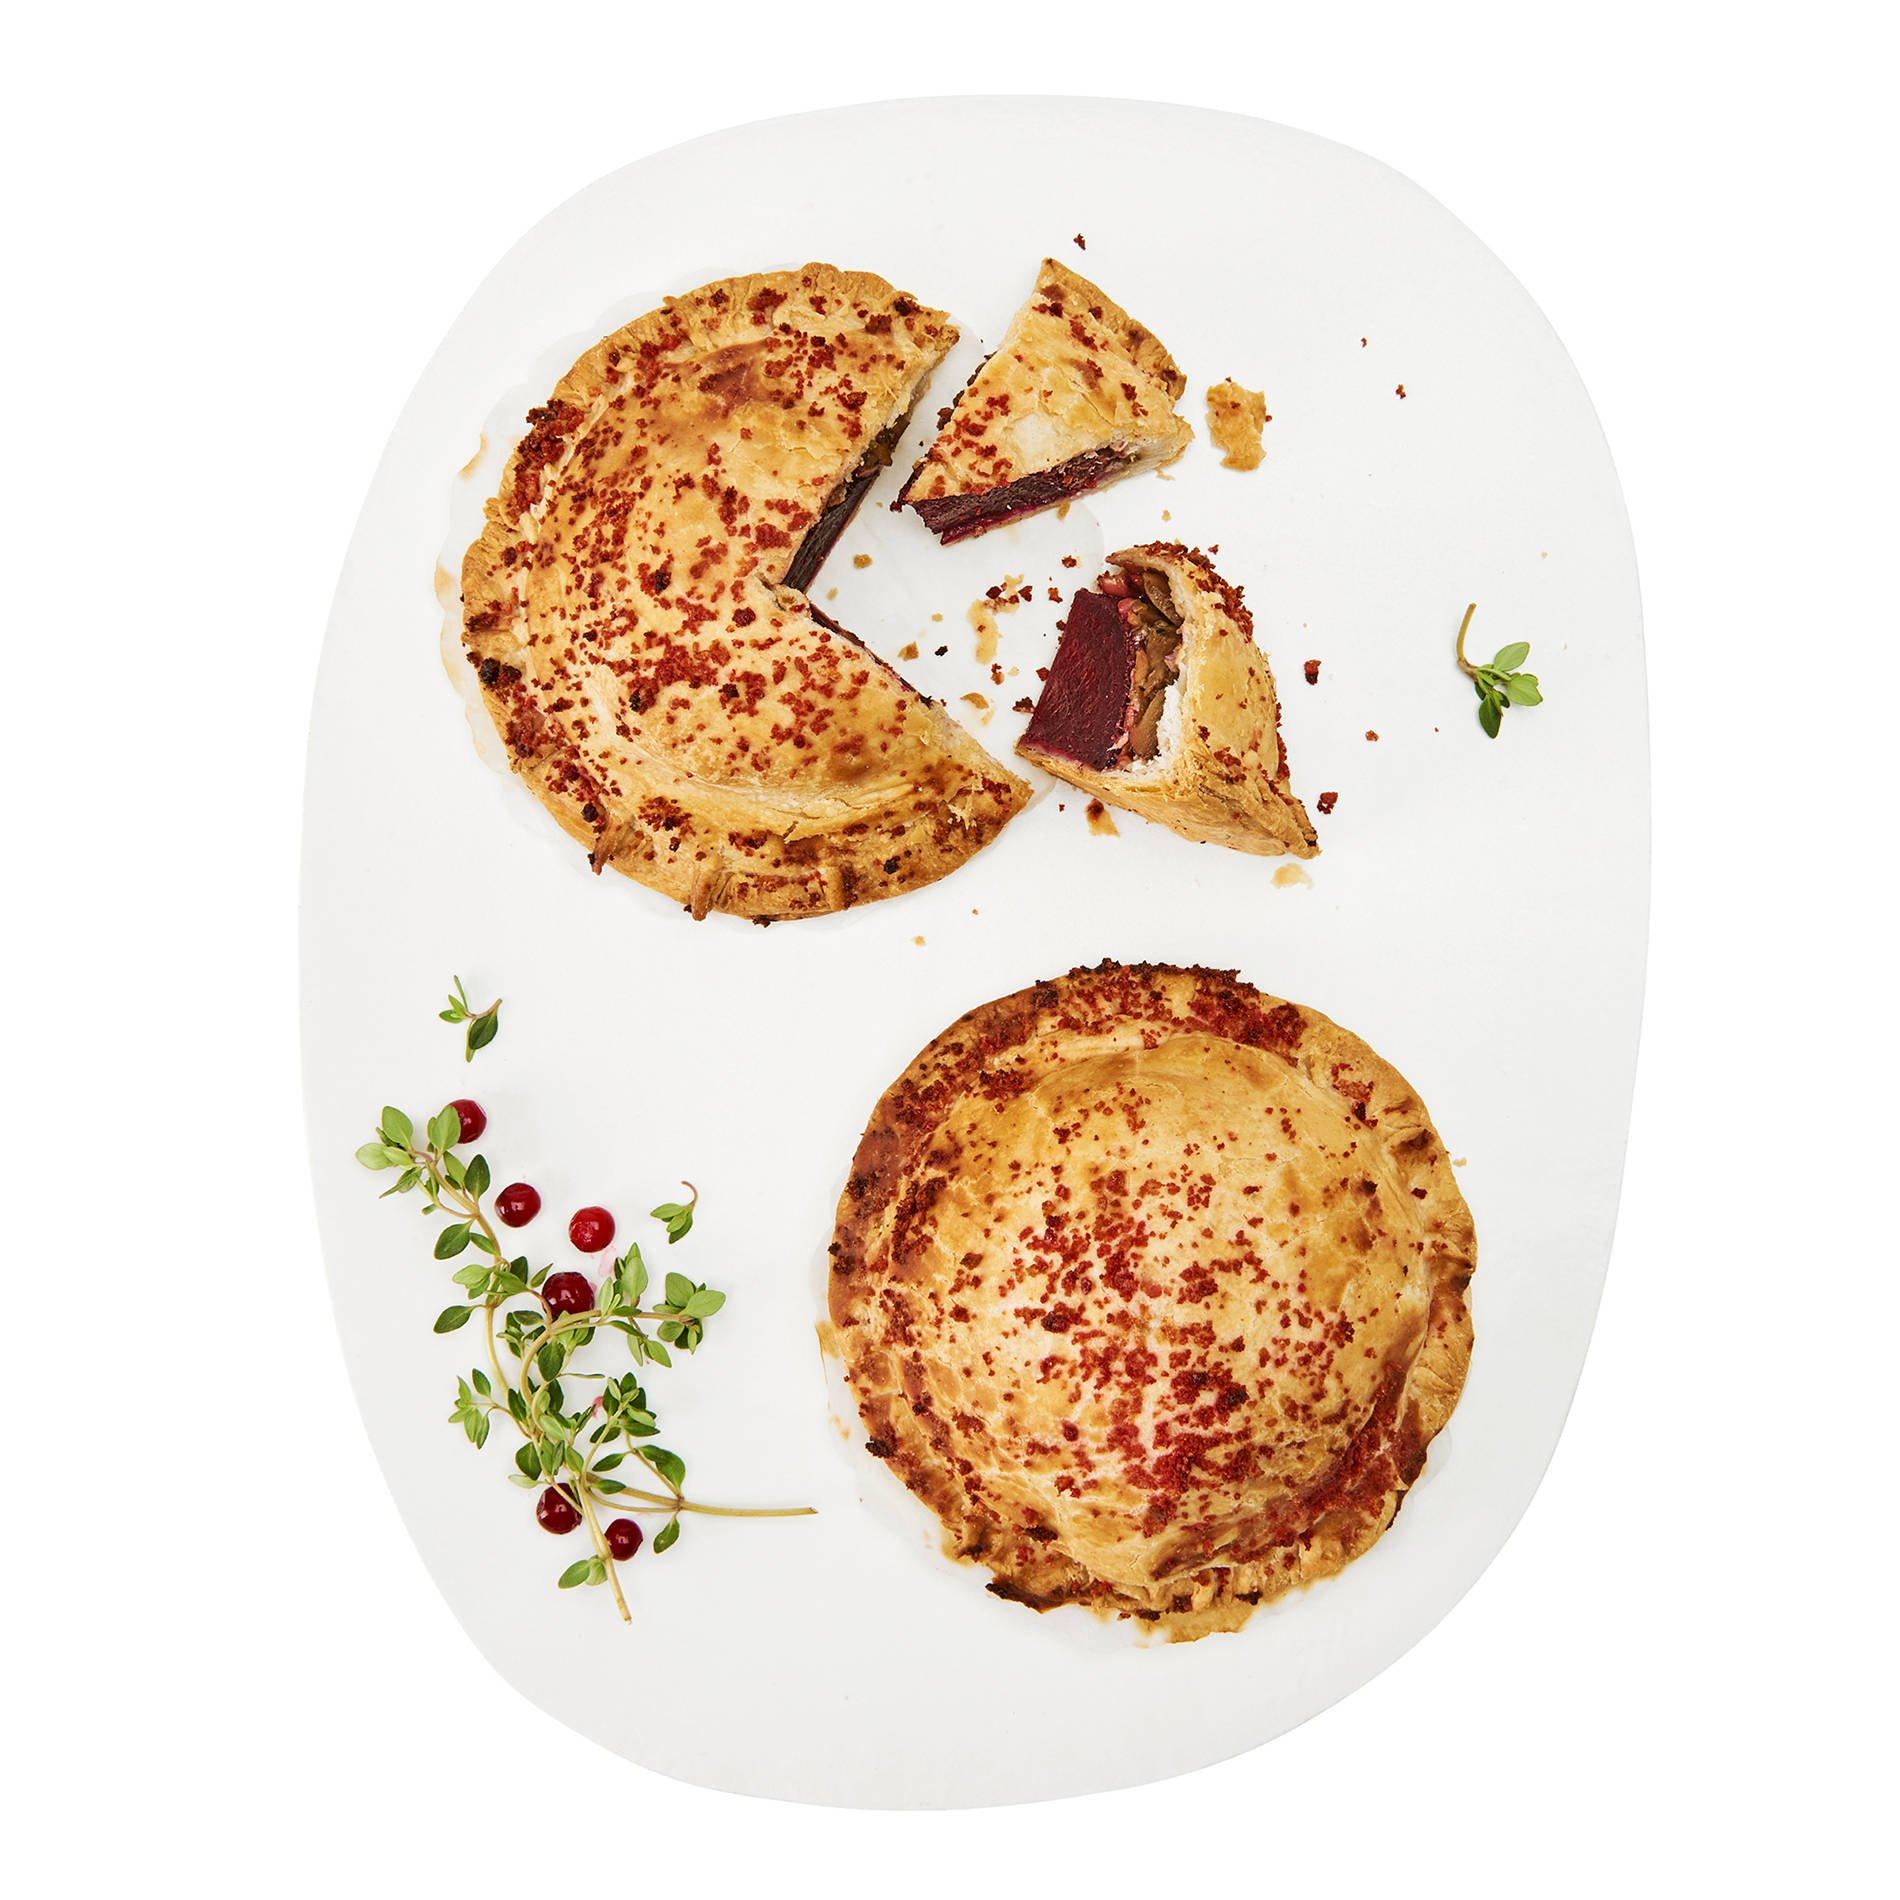 Vegan beet wellingtons - Waitrose Vegan & Vegetarian Festive Food